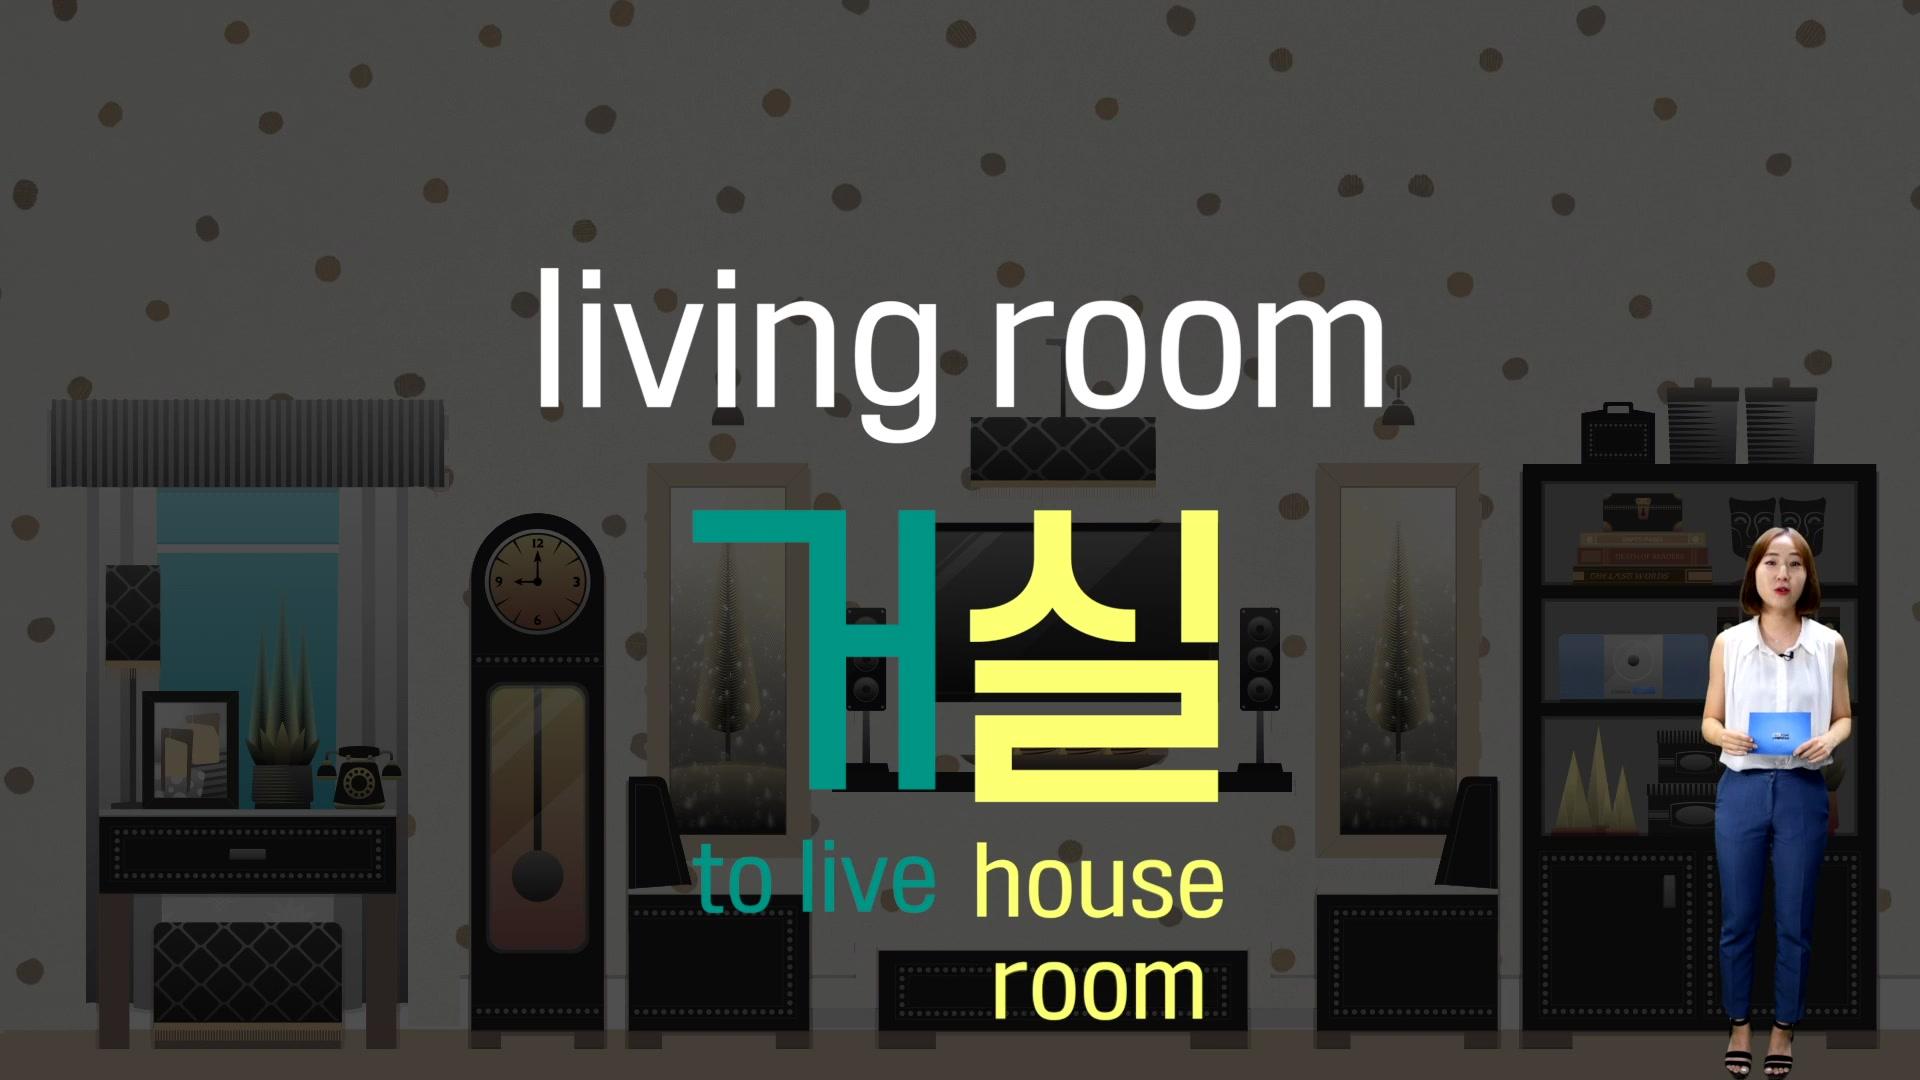 TalkToMeInKorean Episode 117: Must-Know Words in Korean: Types of Rooms (방의 종류)